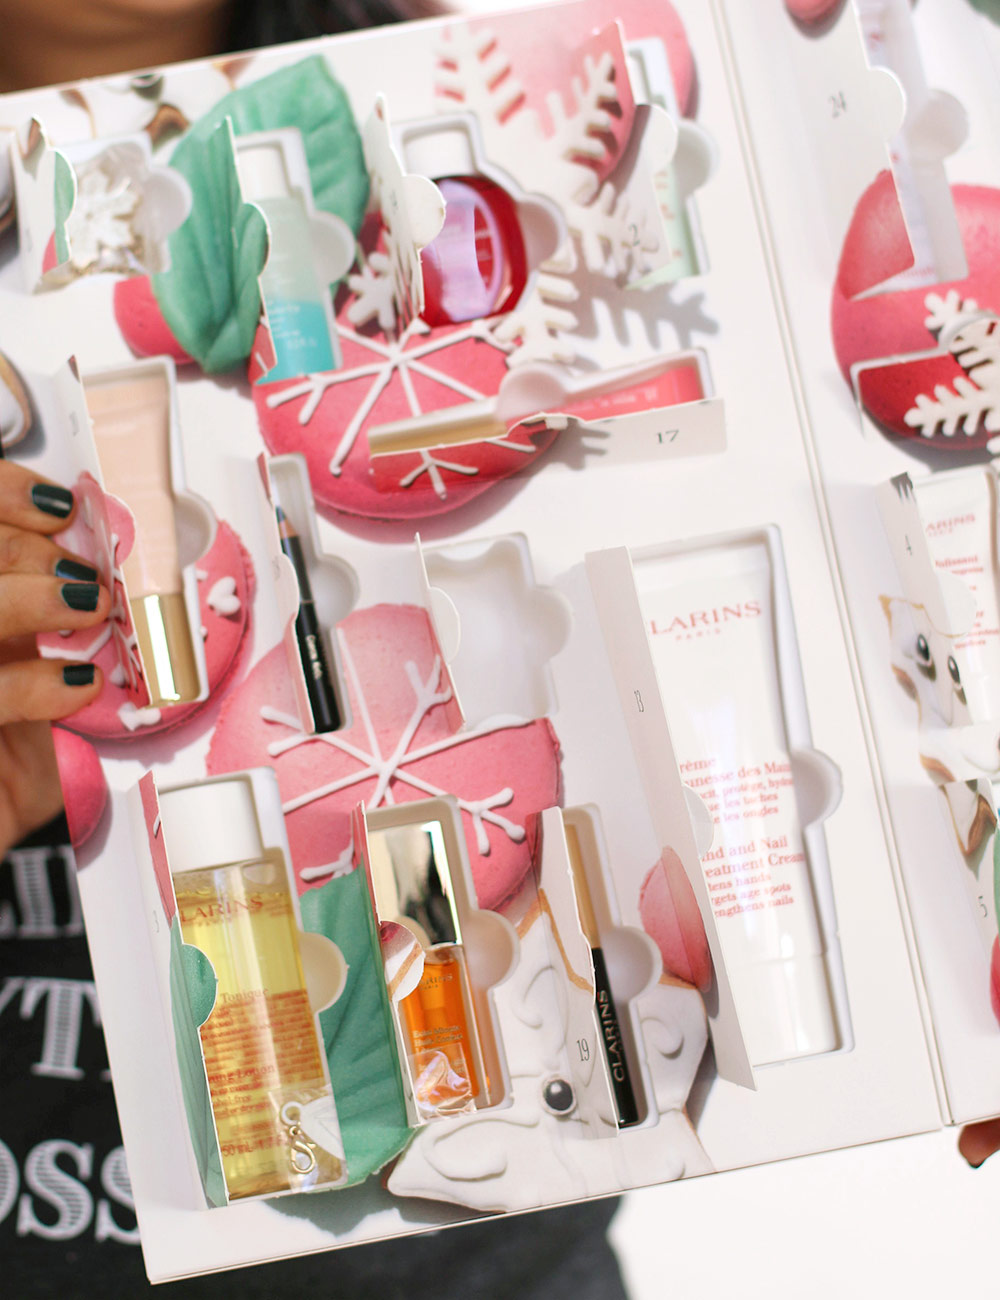 clarins beauty delights advent calendar goodies